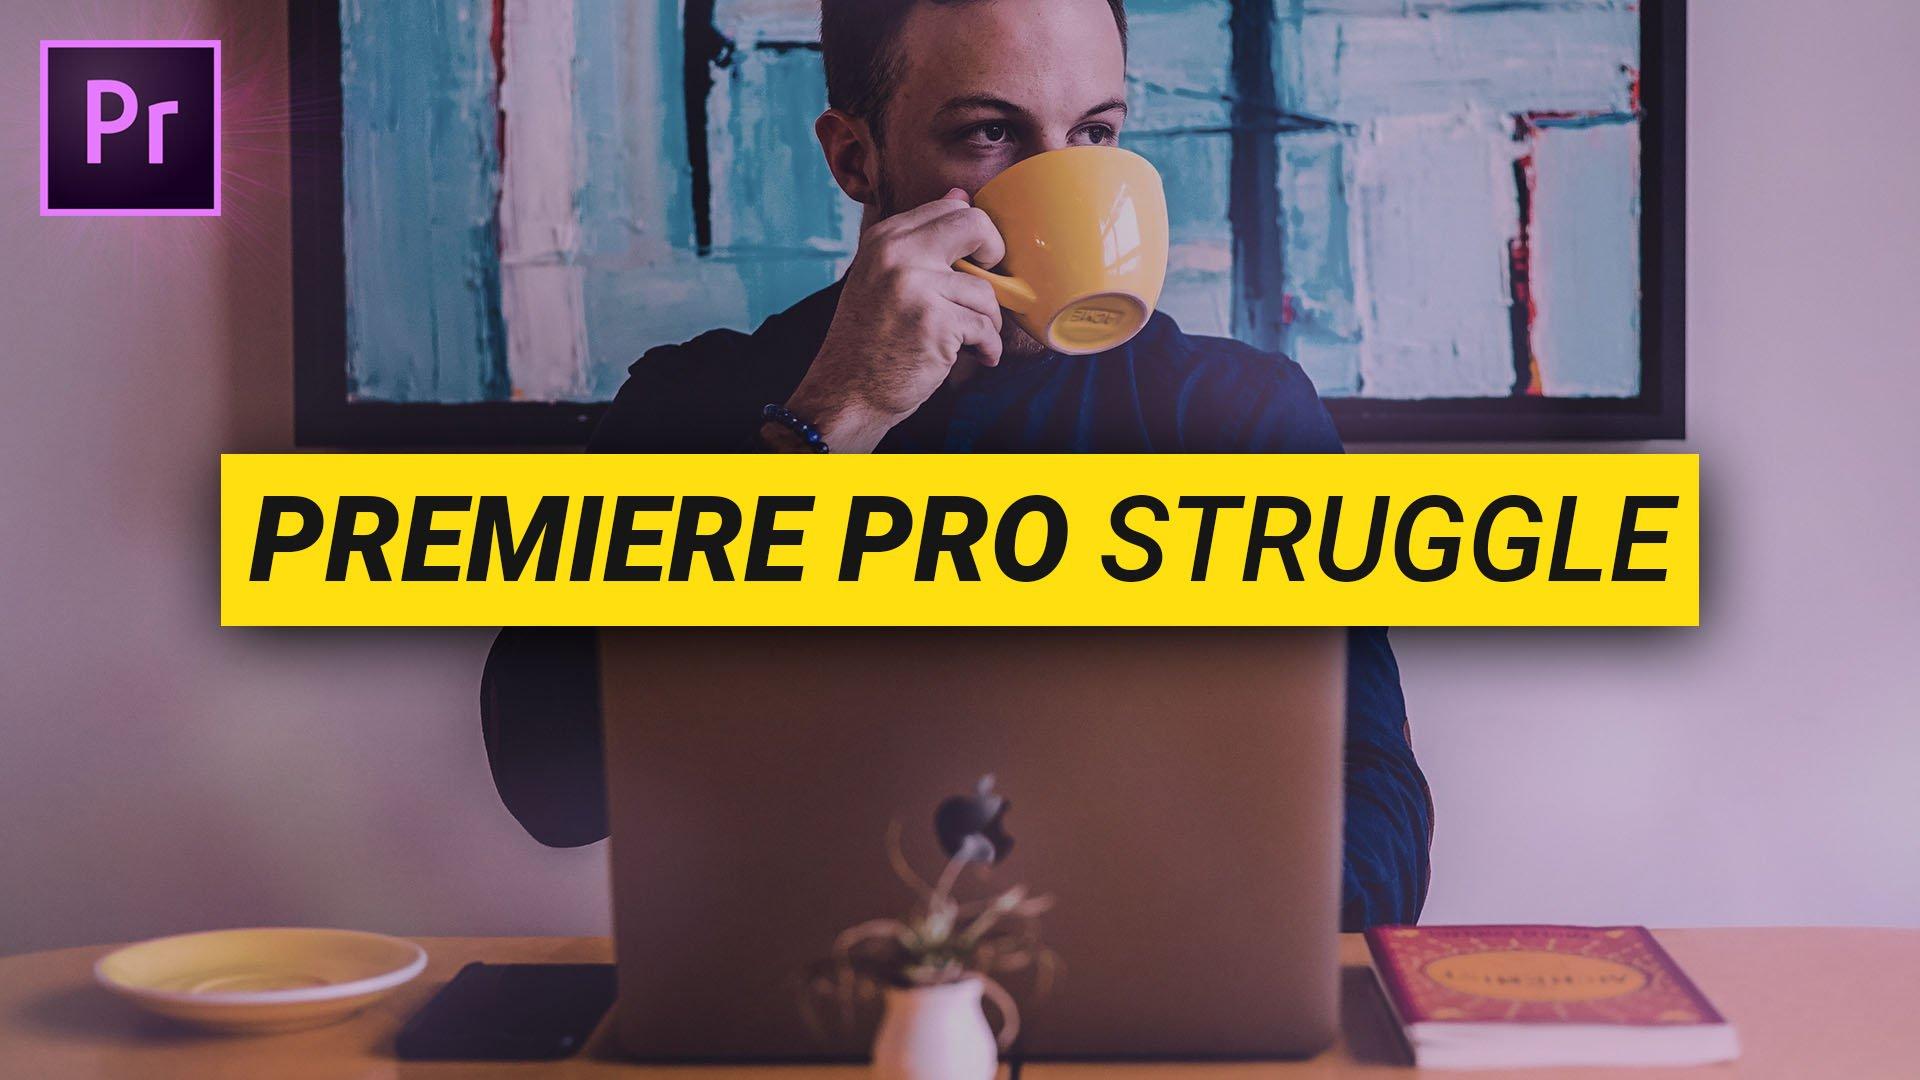 Premiere Pro Struggle